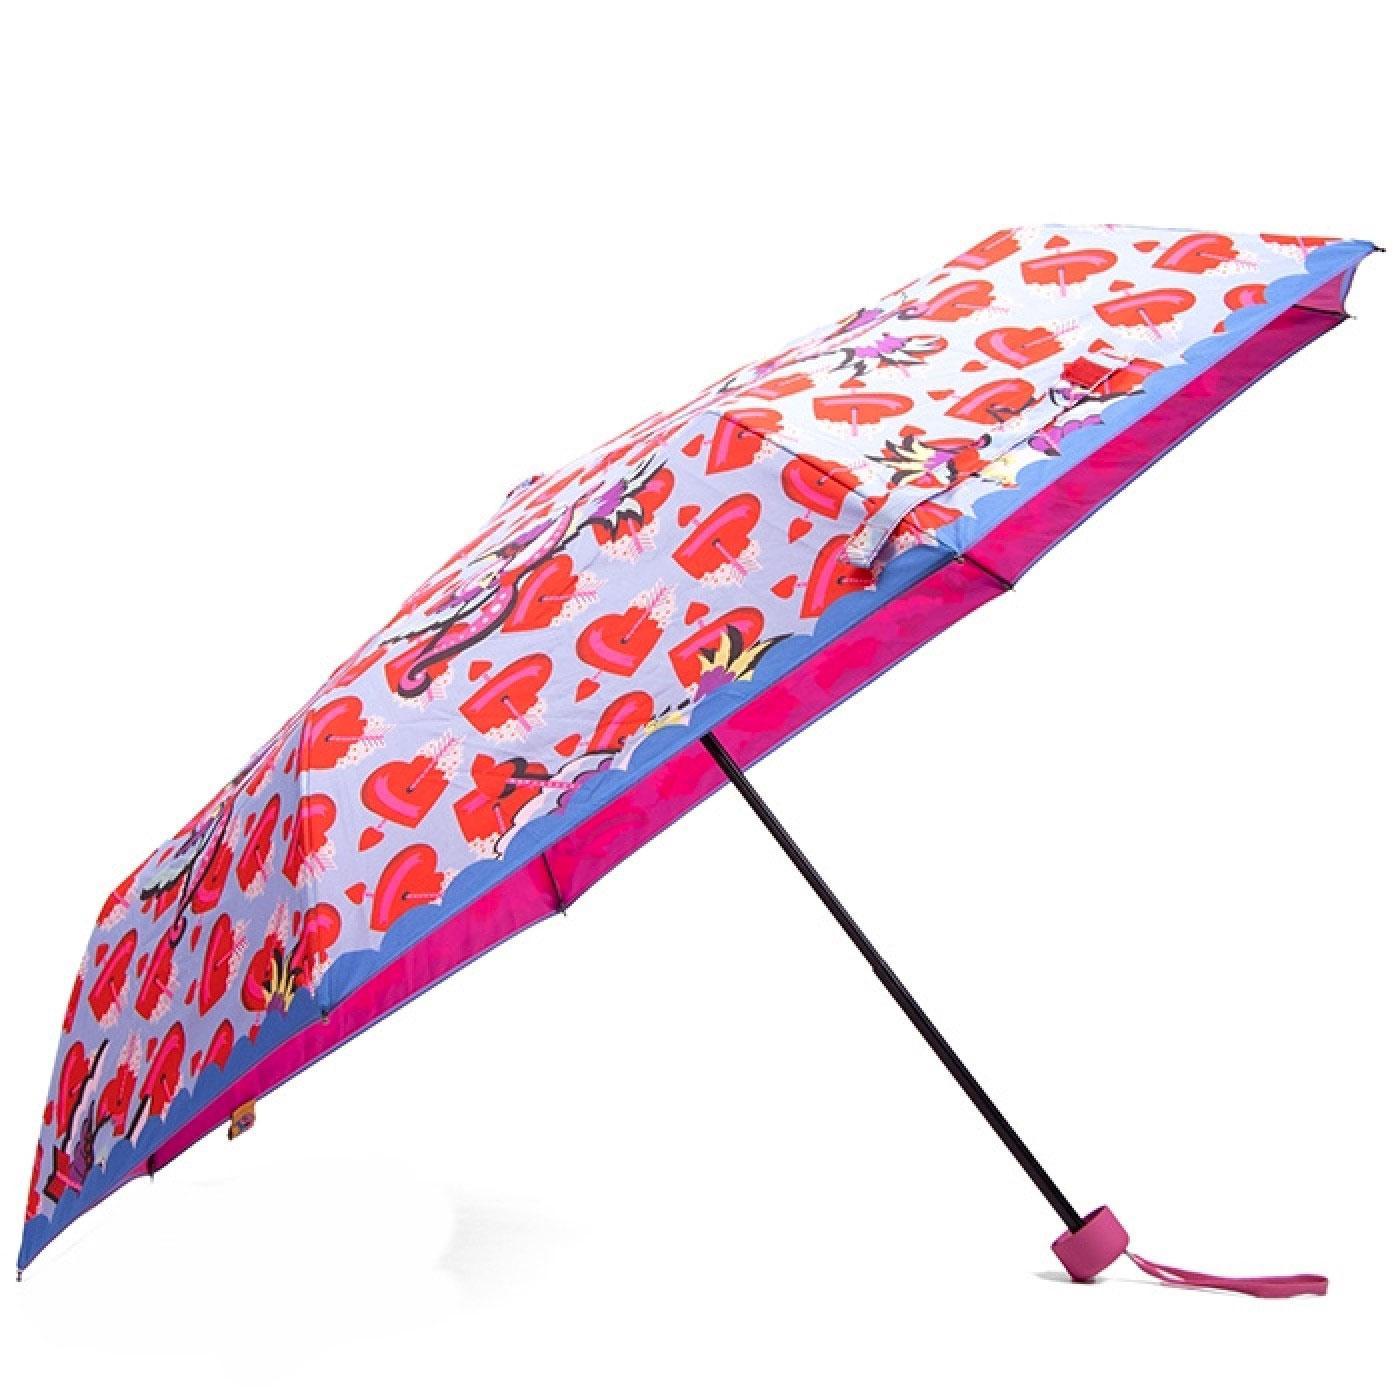 Don't Rain On My Parade IRREGULAR CHOICE Umbrella